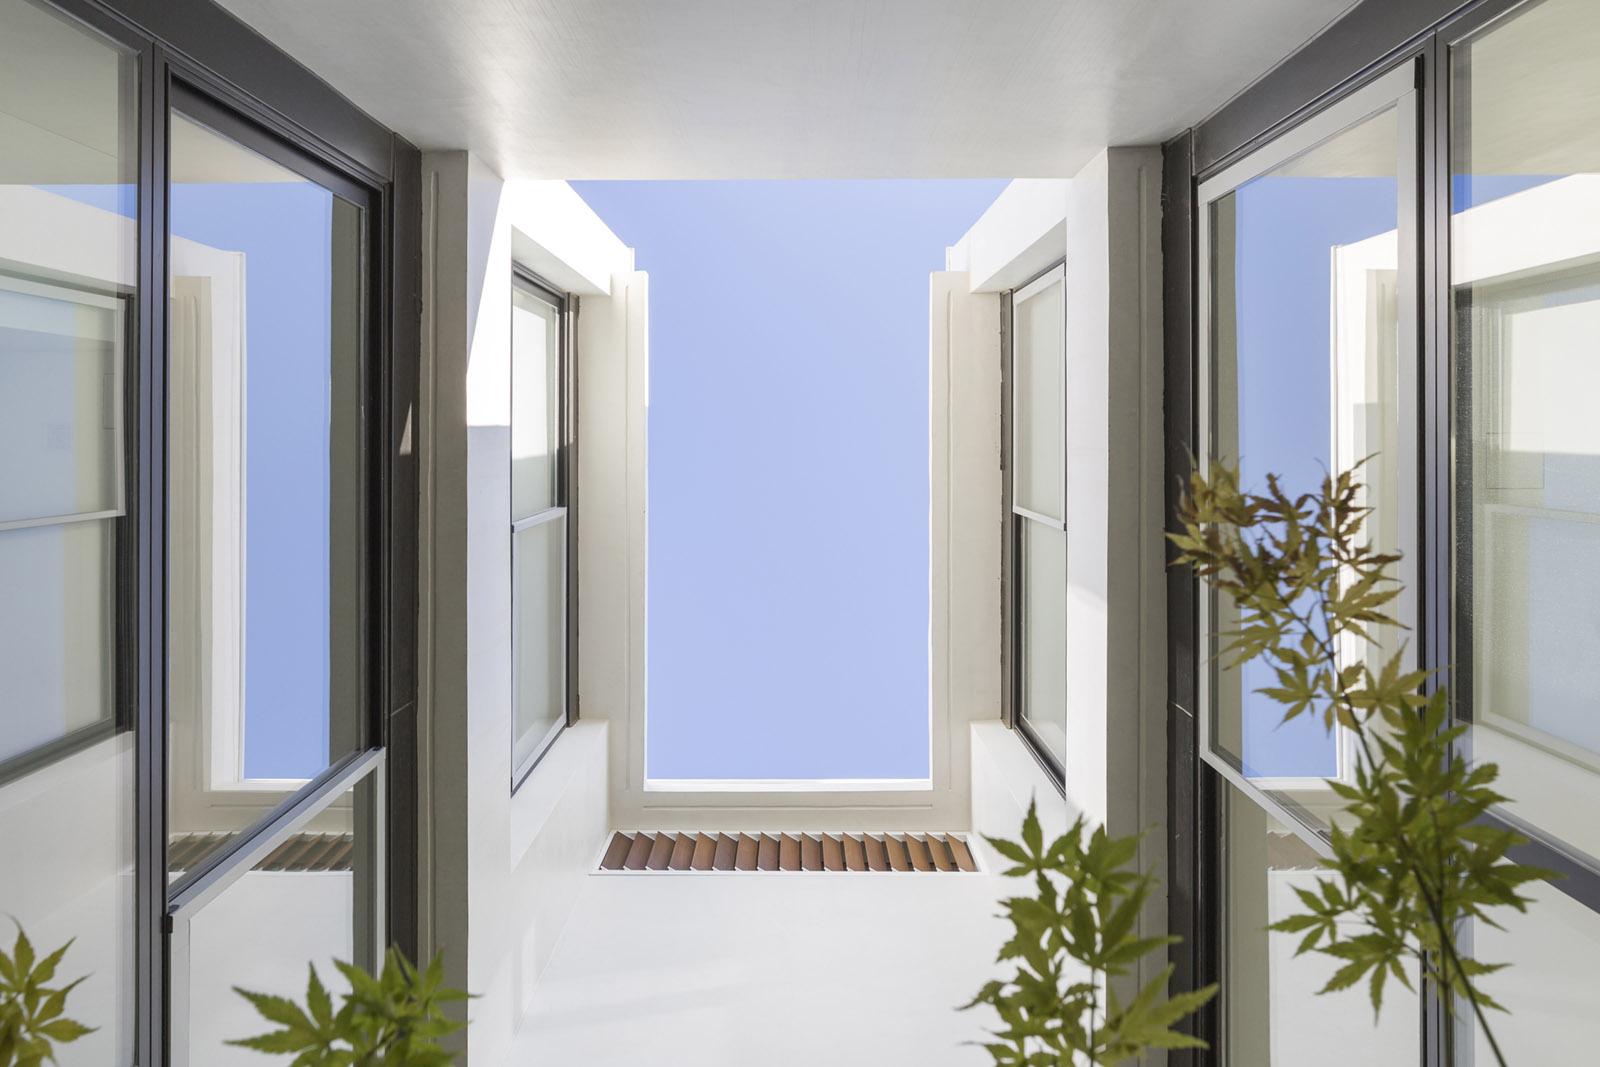 Architectural700-Interior-photographer-Madrid-Spain-.jpg